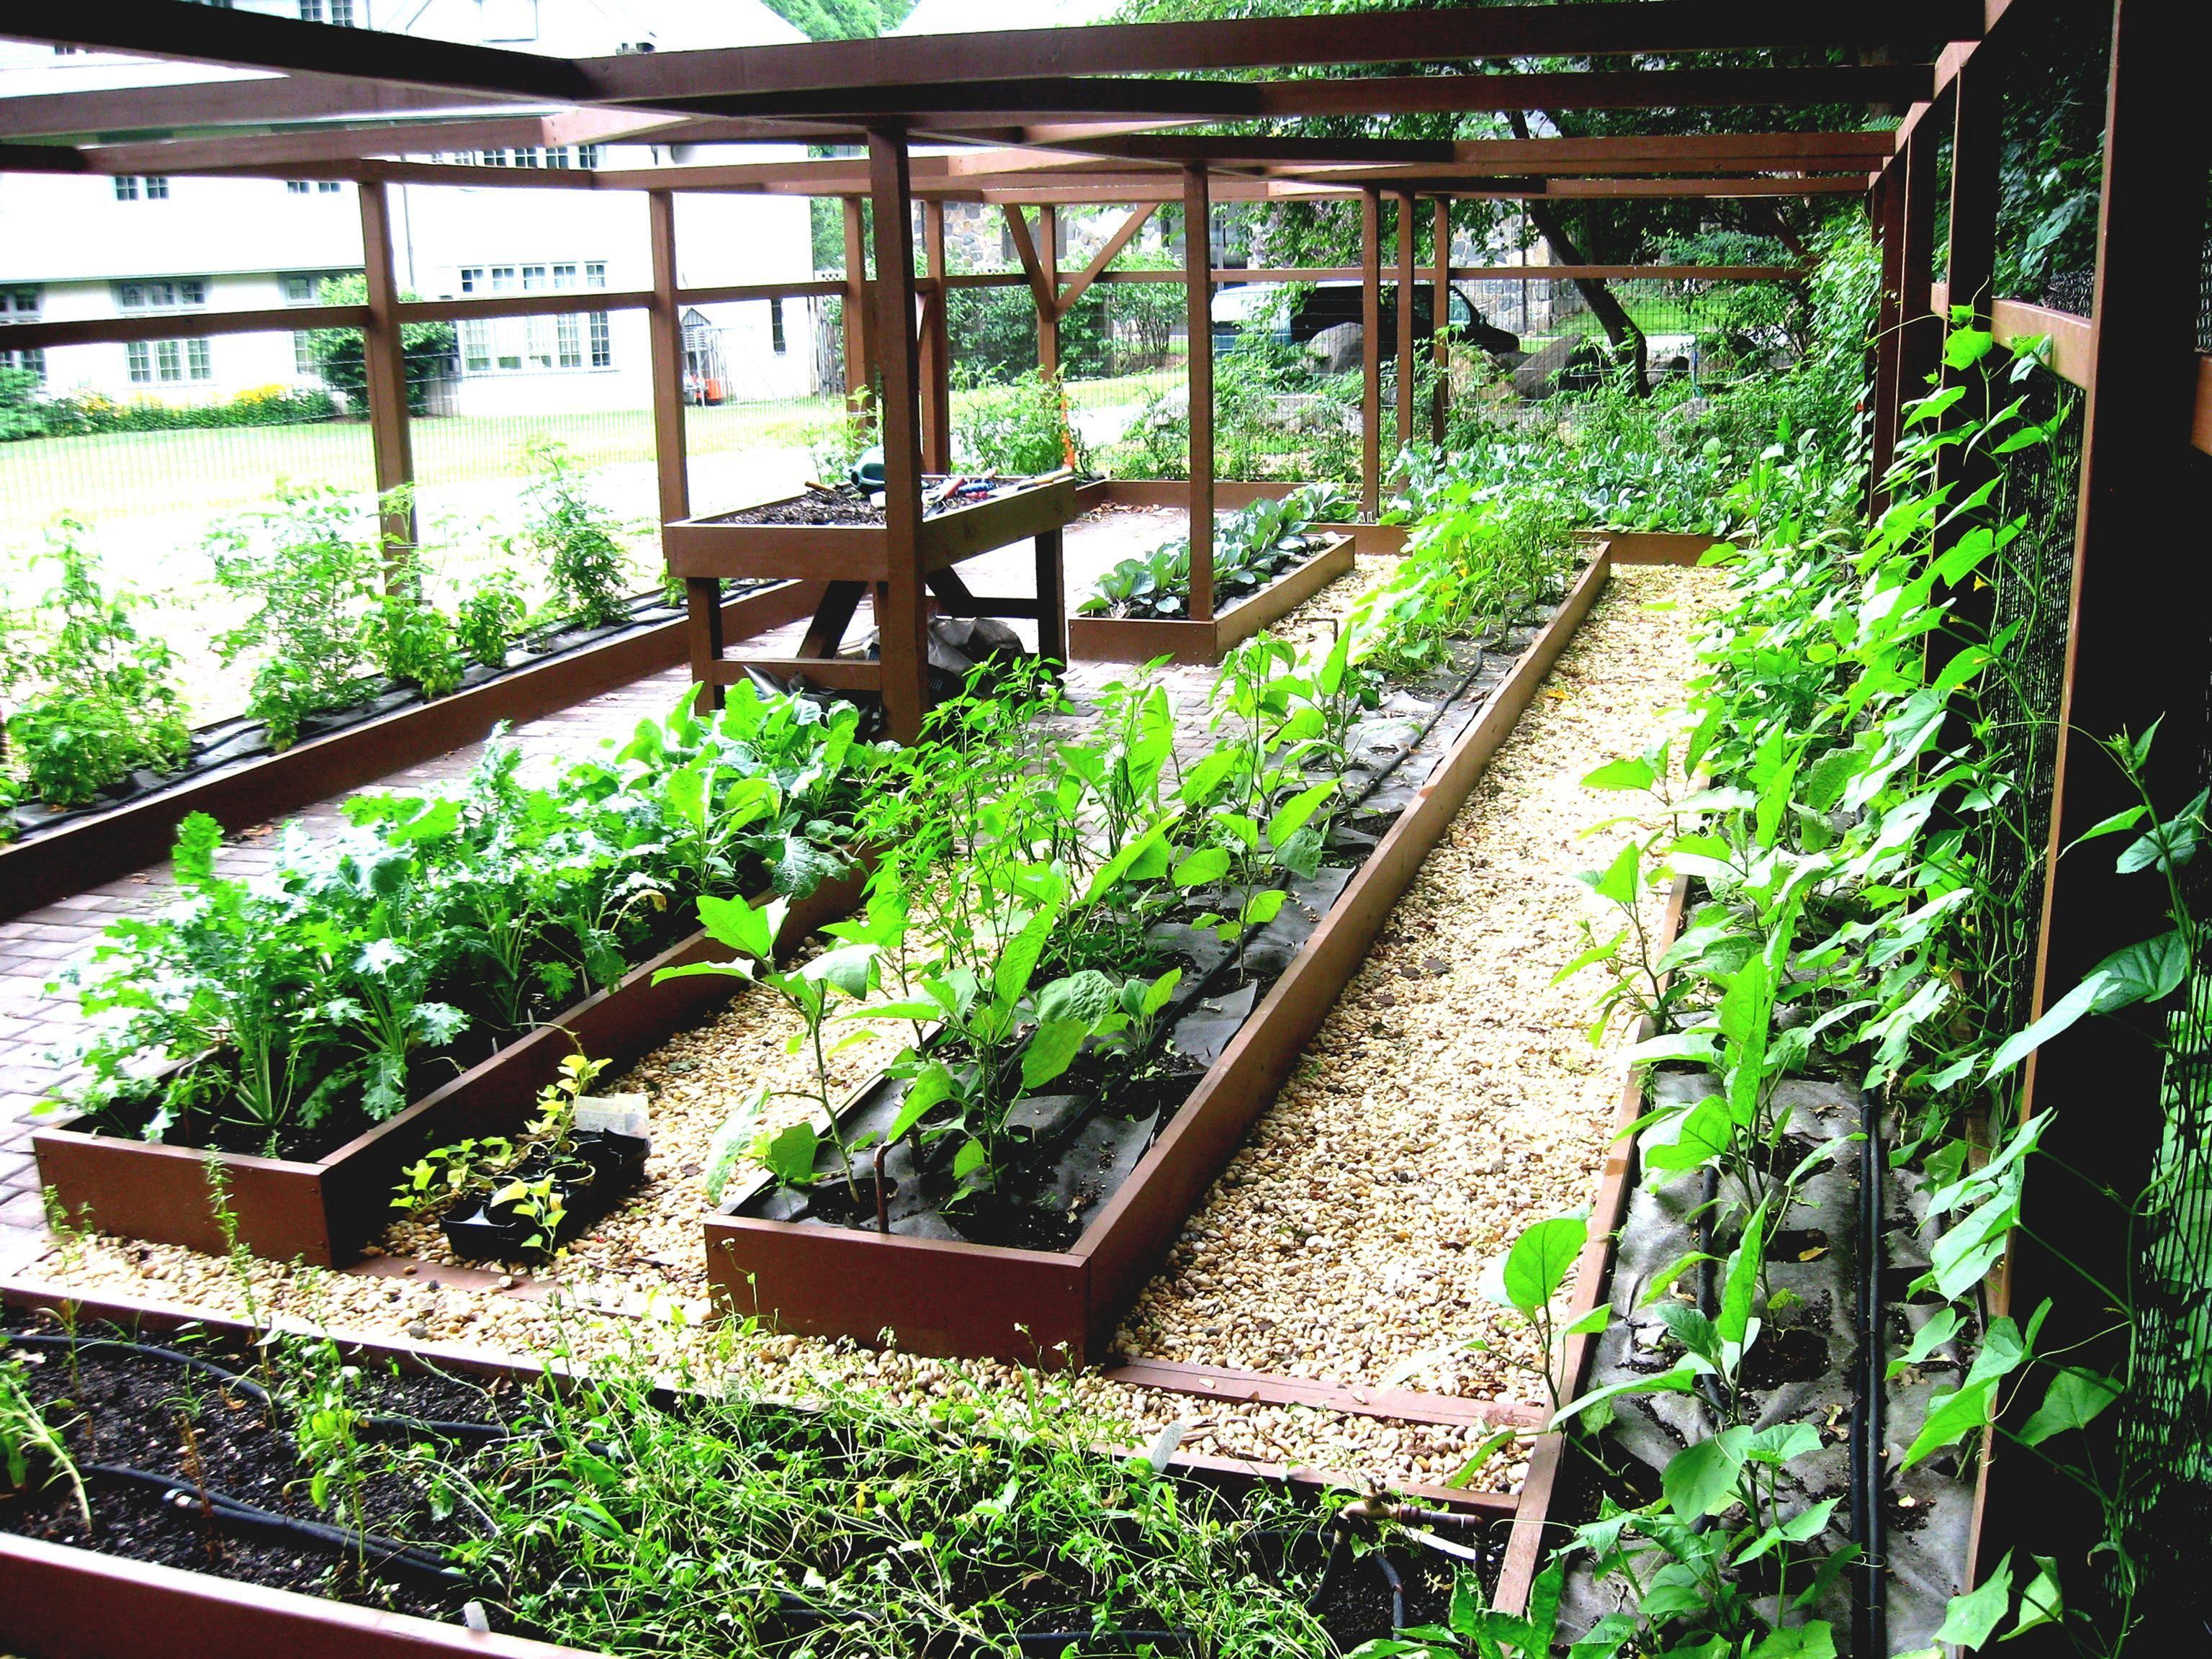 10 Minimalist Creative Garden Ideas To Enhance Your Small ...